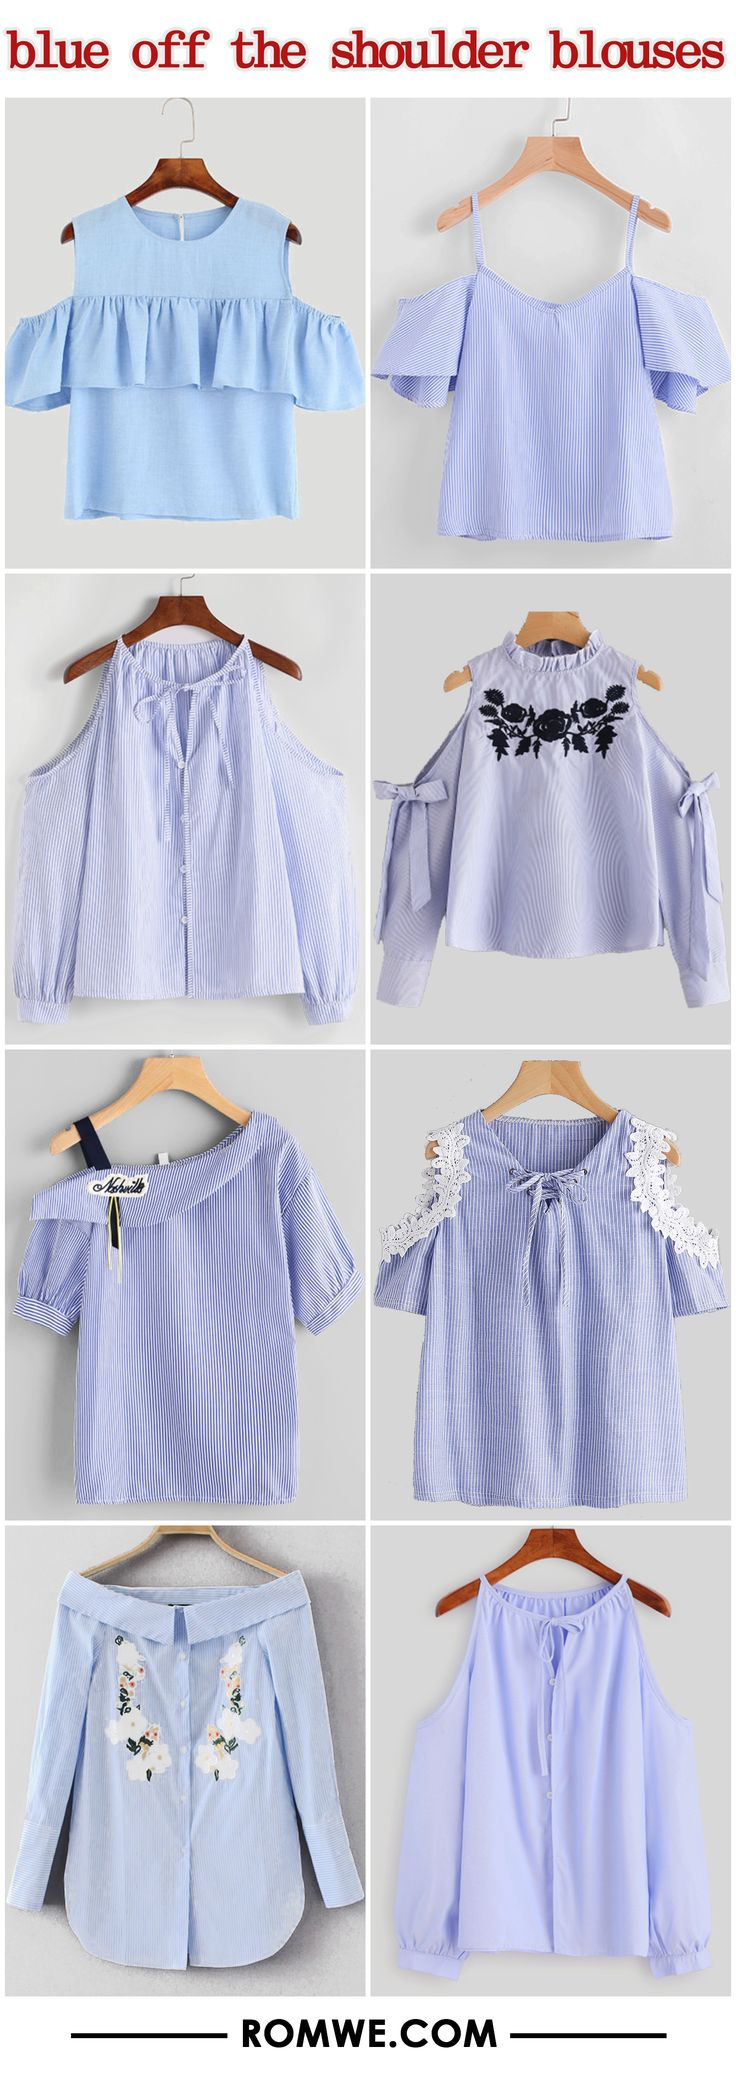 blue off the shoulder blouses 2017 - romwe.com